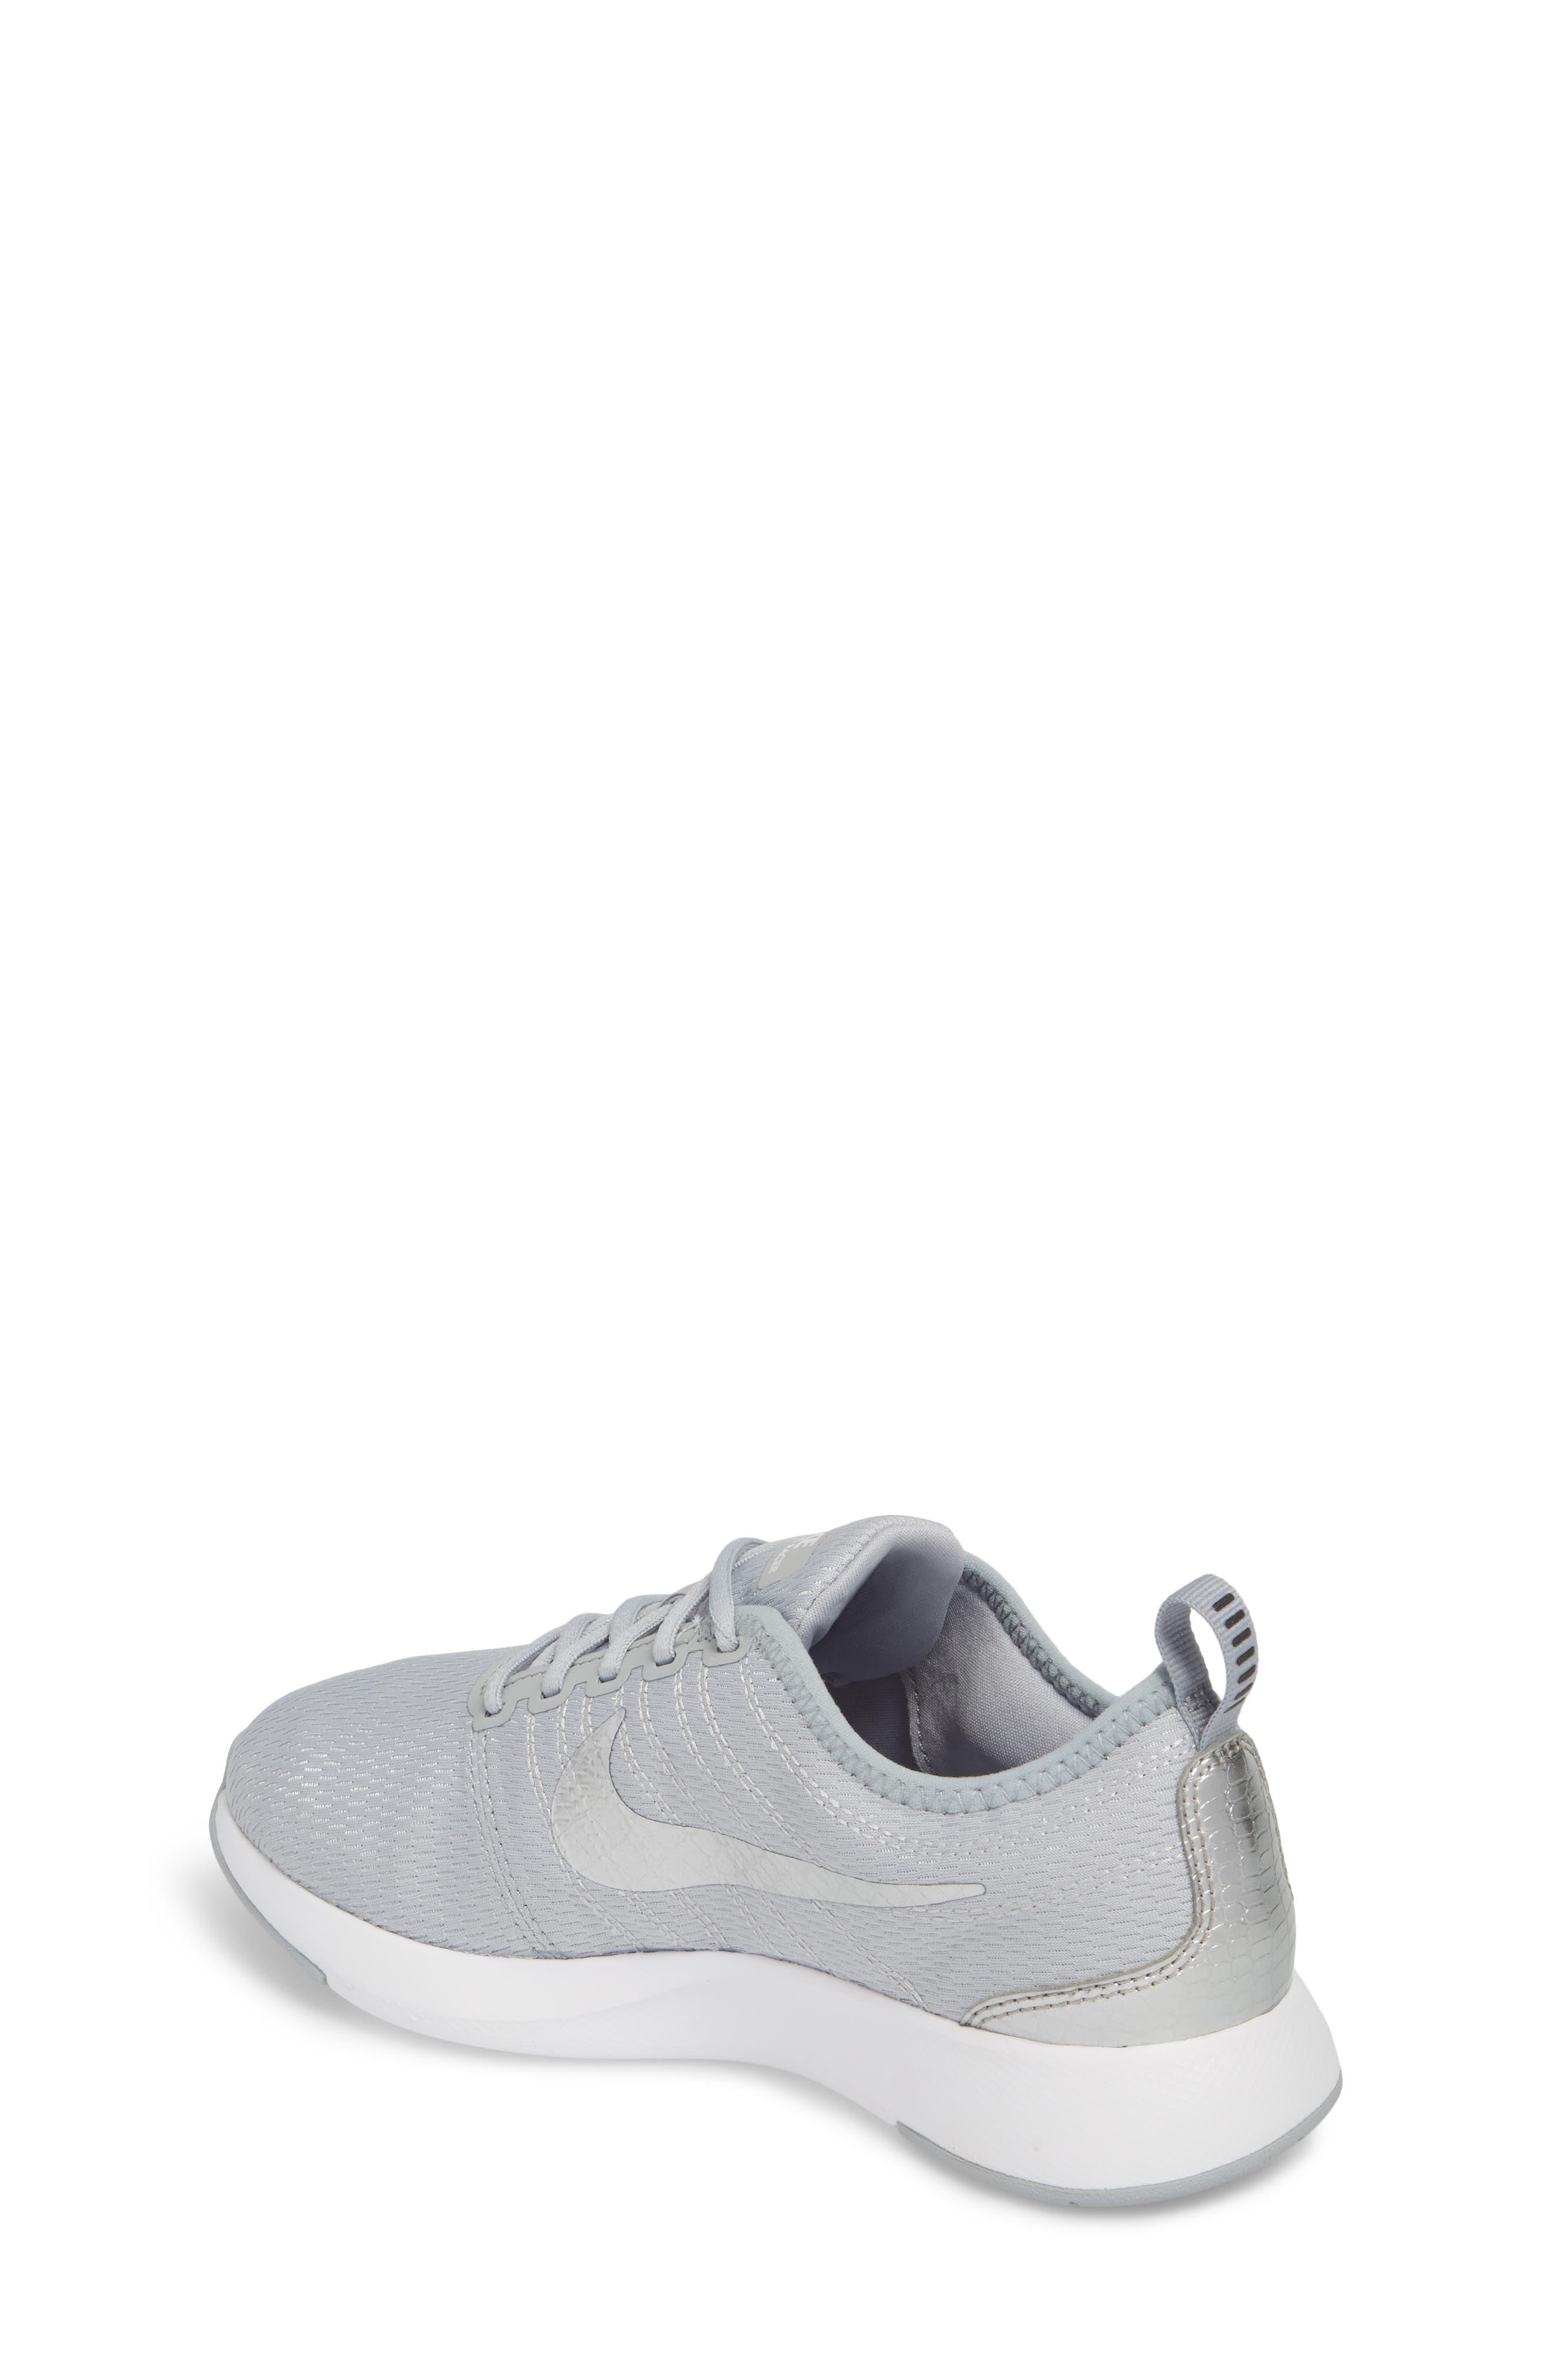 Dualtone Racer GS Sneaker,                             Alternate thumbnail 2, color,                             Wolf Grey/ Metallic Silver